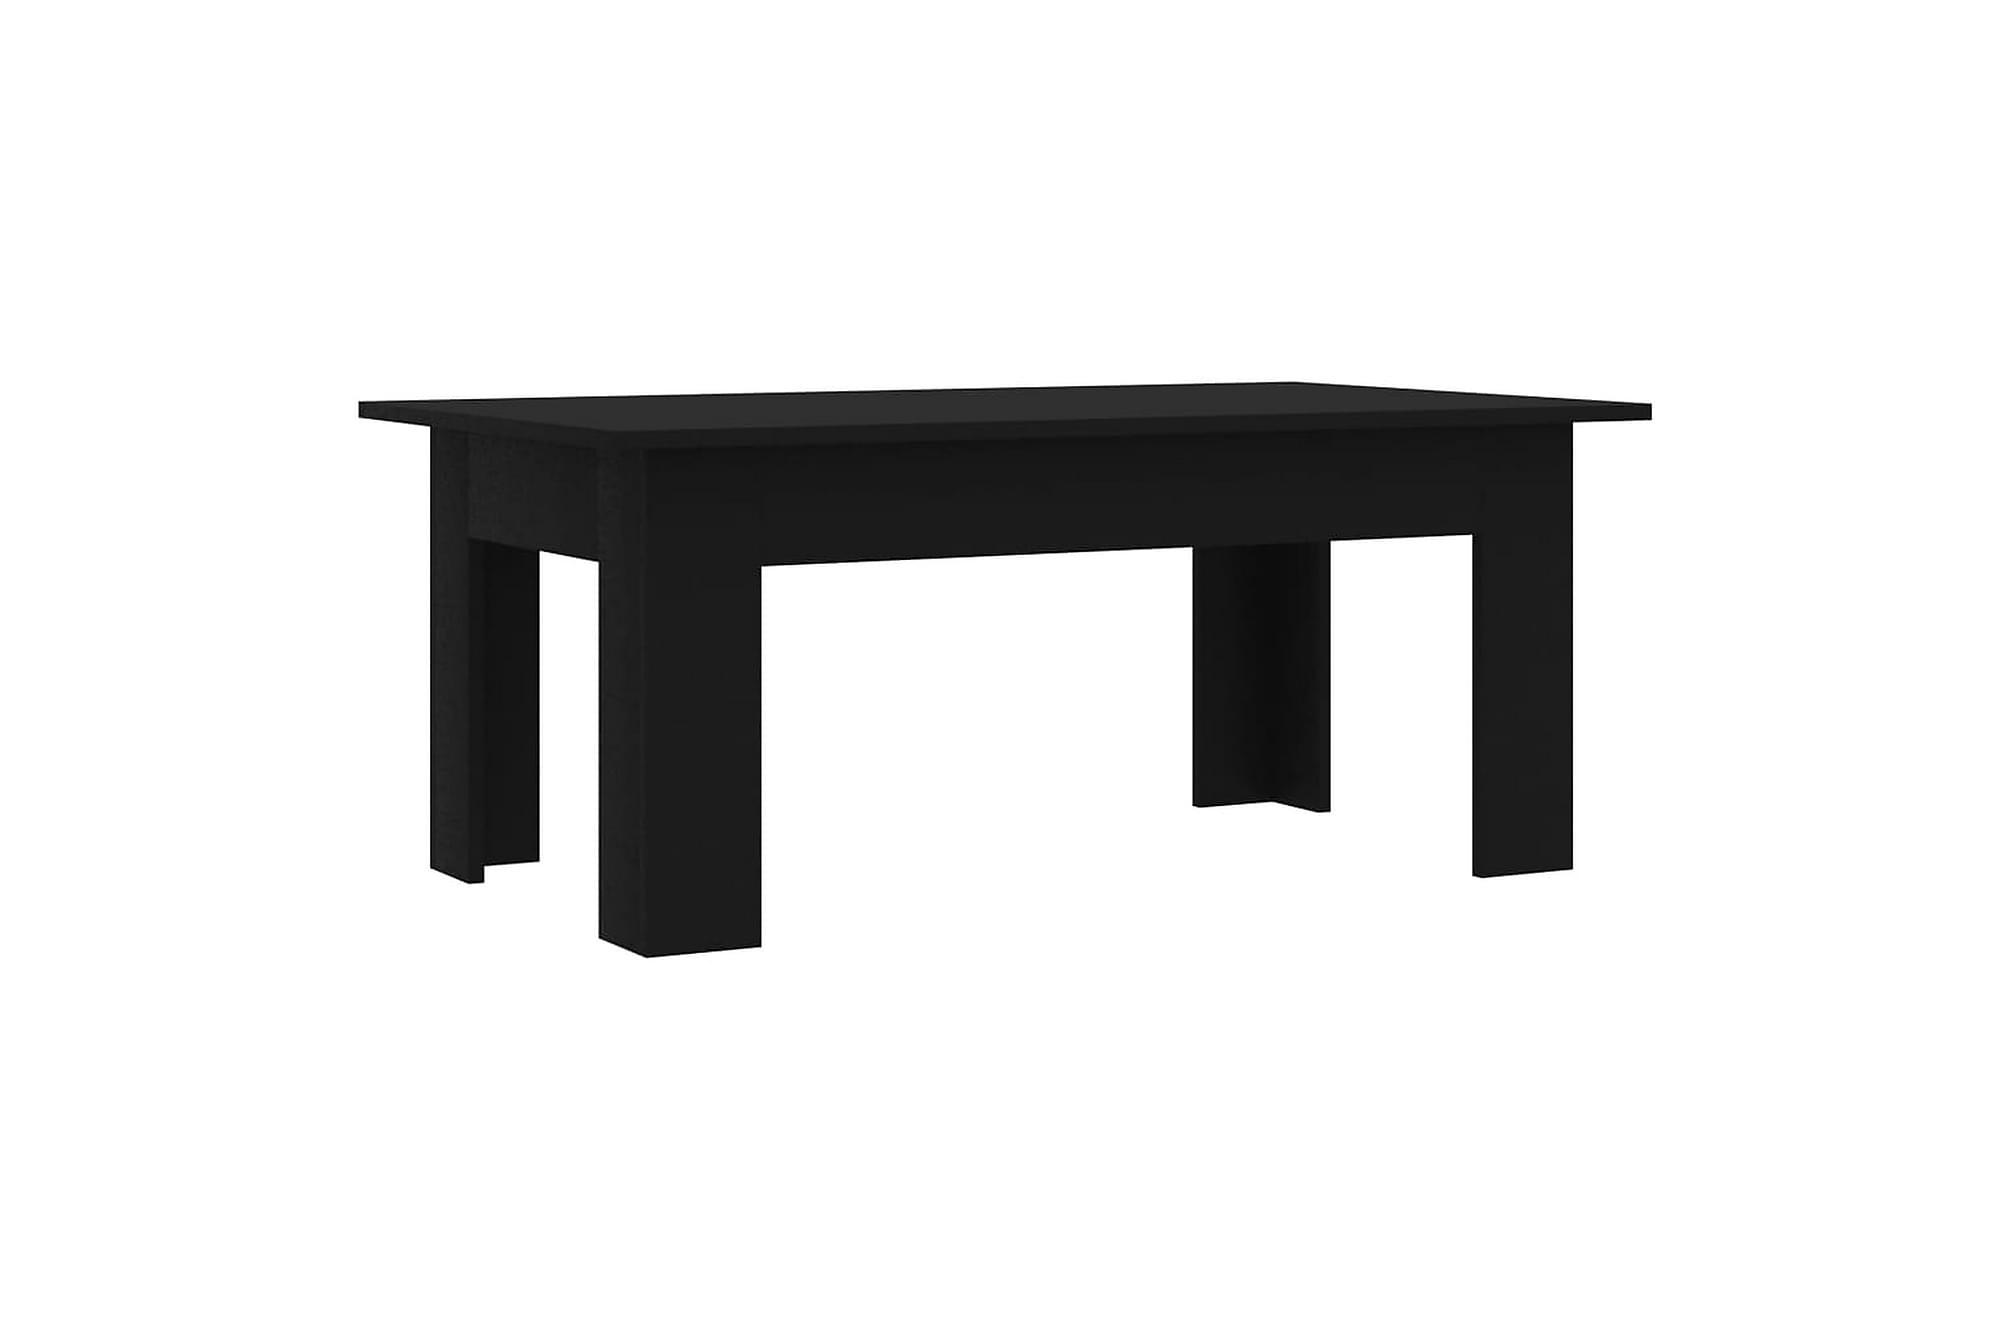 Soffbord svart 100x60x42 cm spånskiva